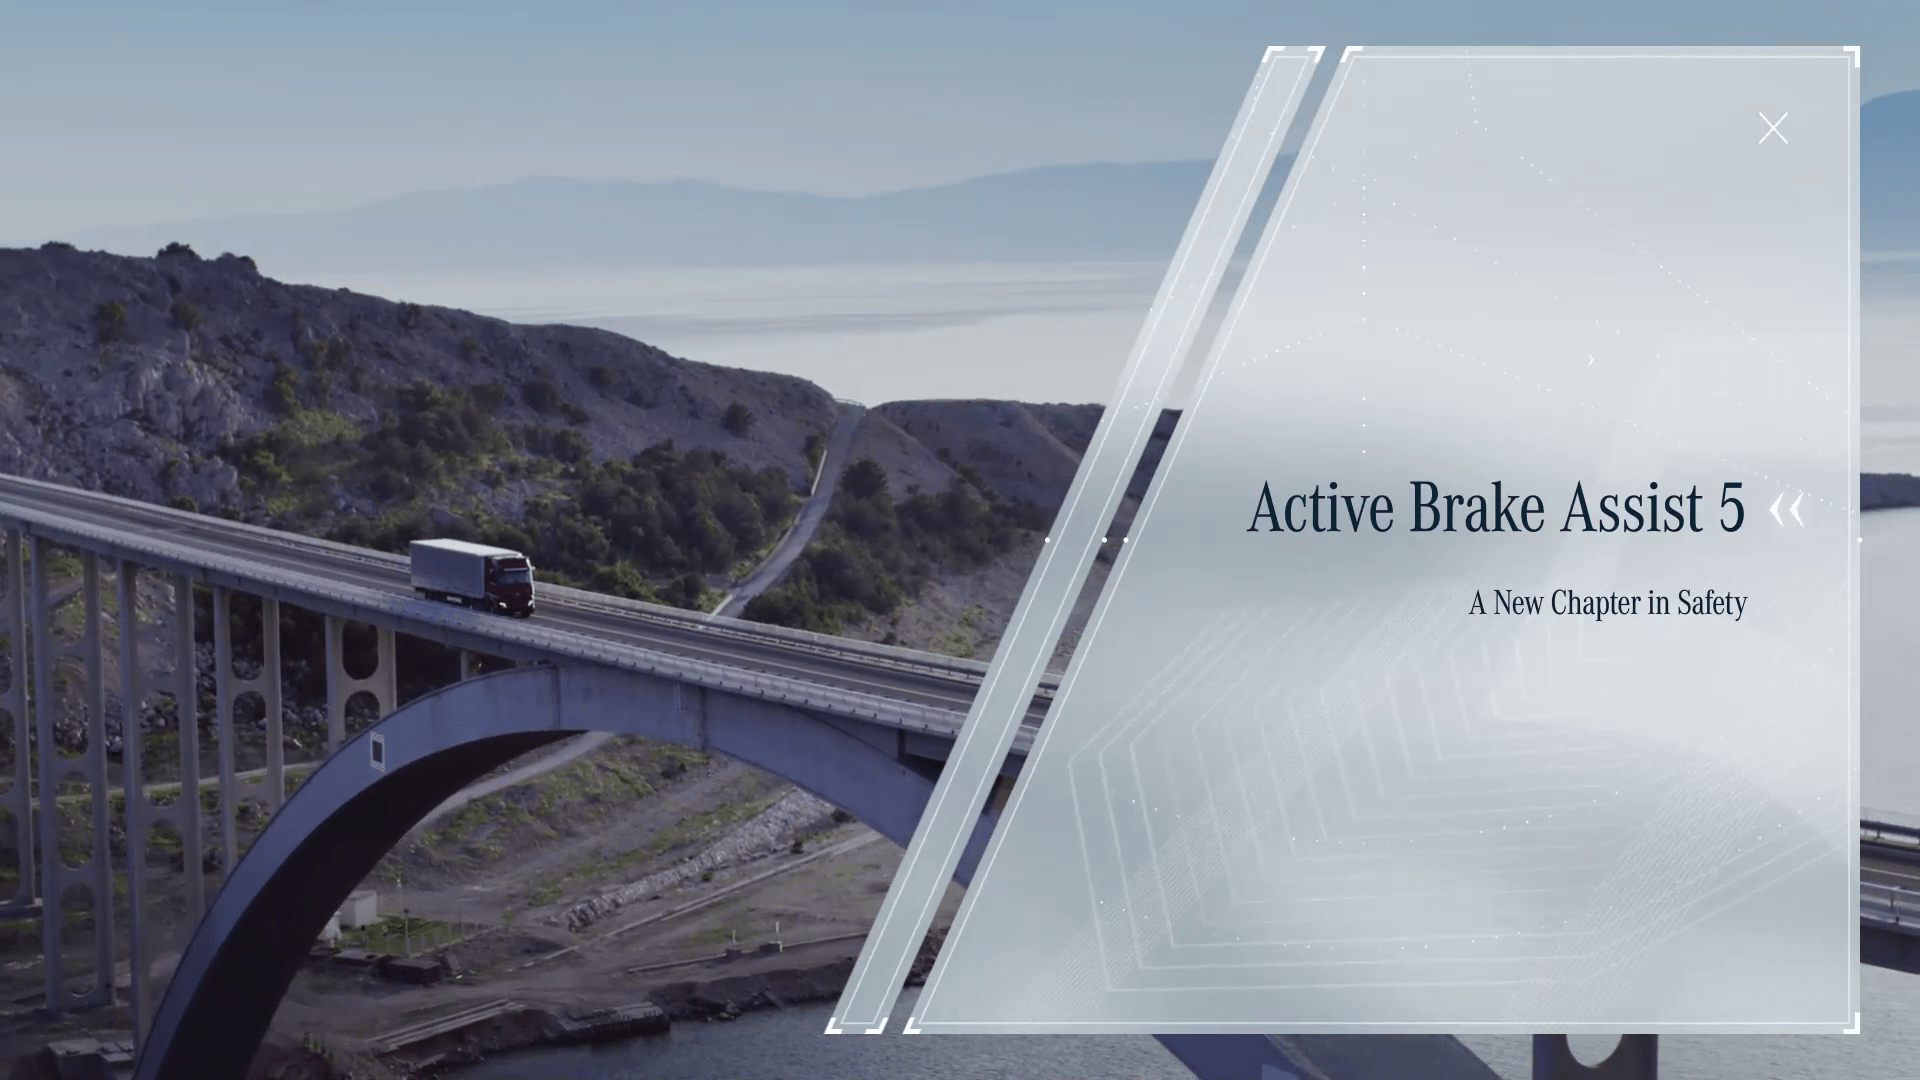 Active Brake Assist 5